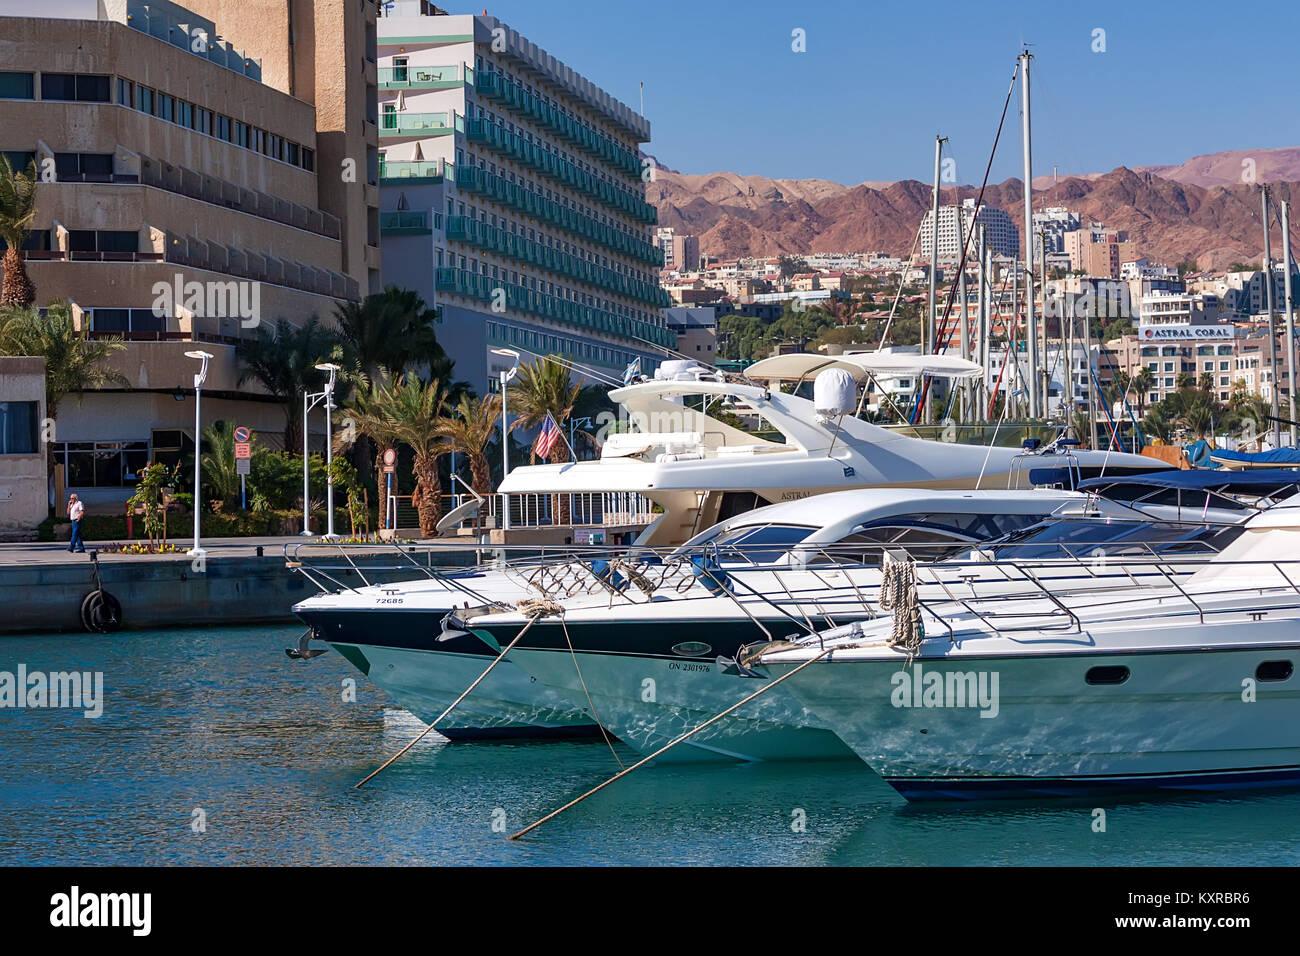 EILAT, ISRAEL - NOVEMBER 2011: Marina with docked yachts - Stock Image